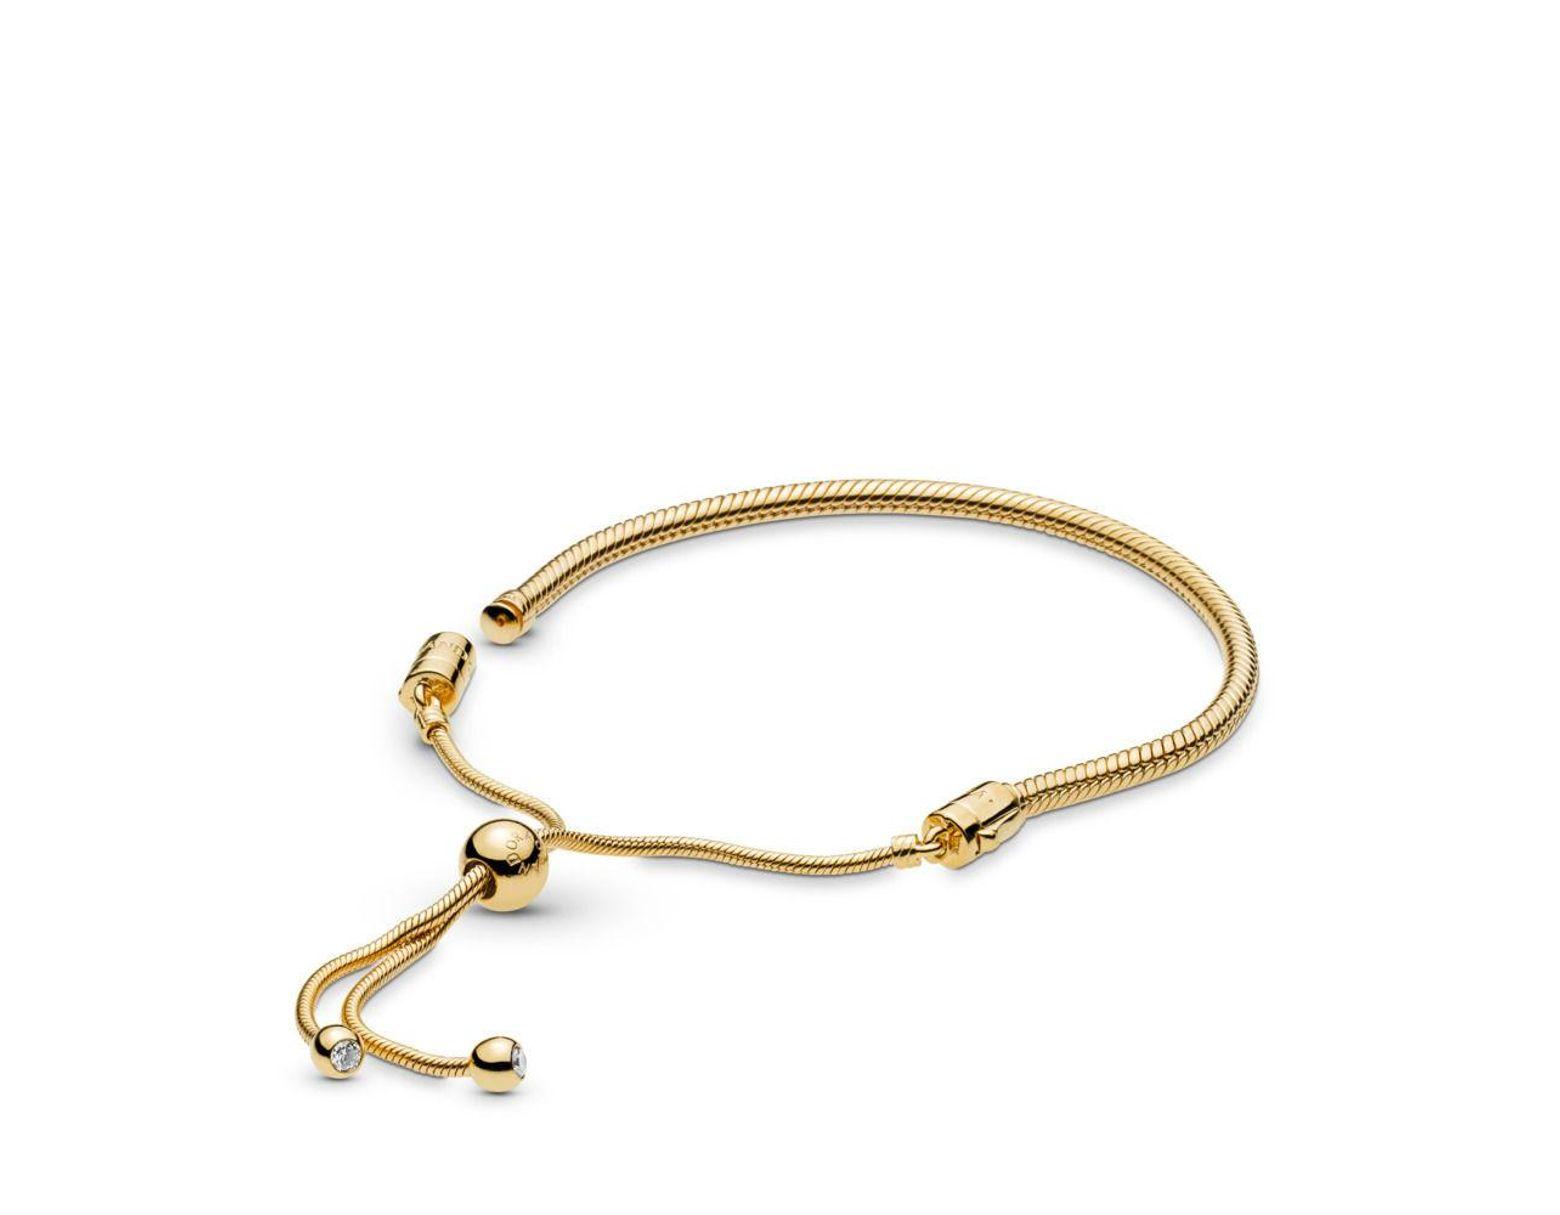 cb2eac7e1 PANDORA Shinetm Sliding Bracelet in Metallic - Lyst